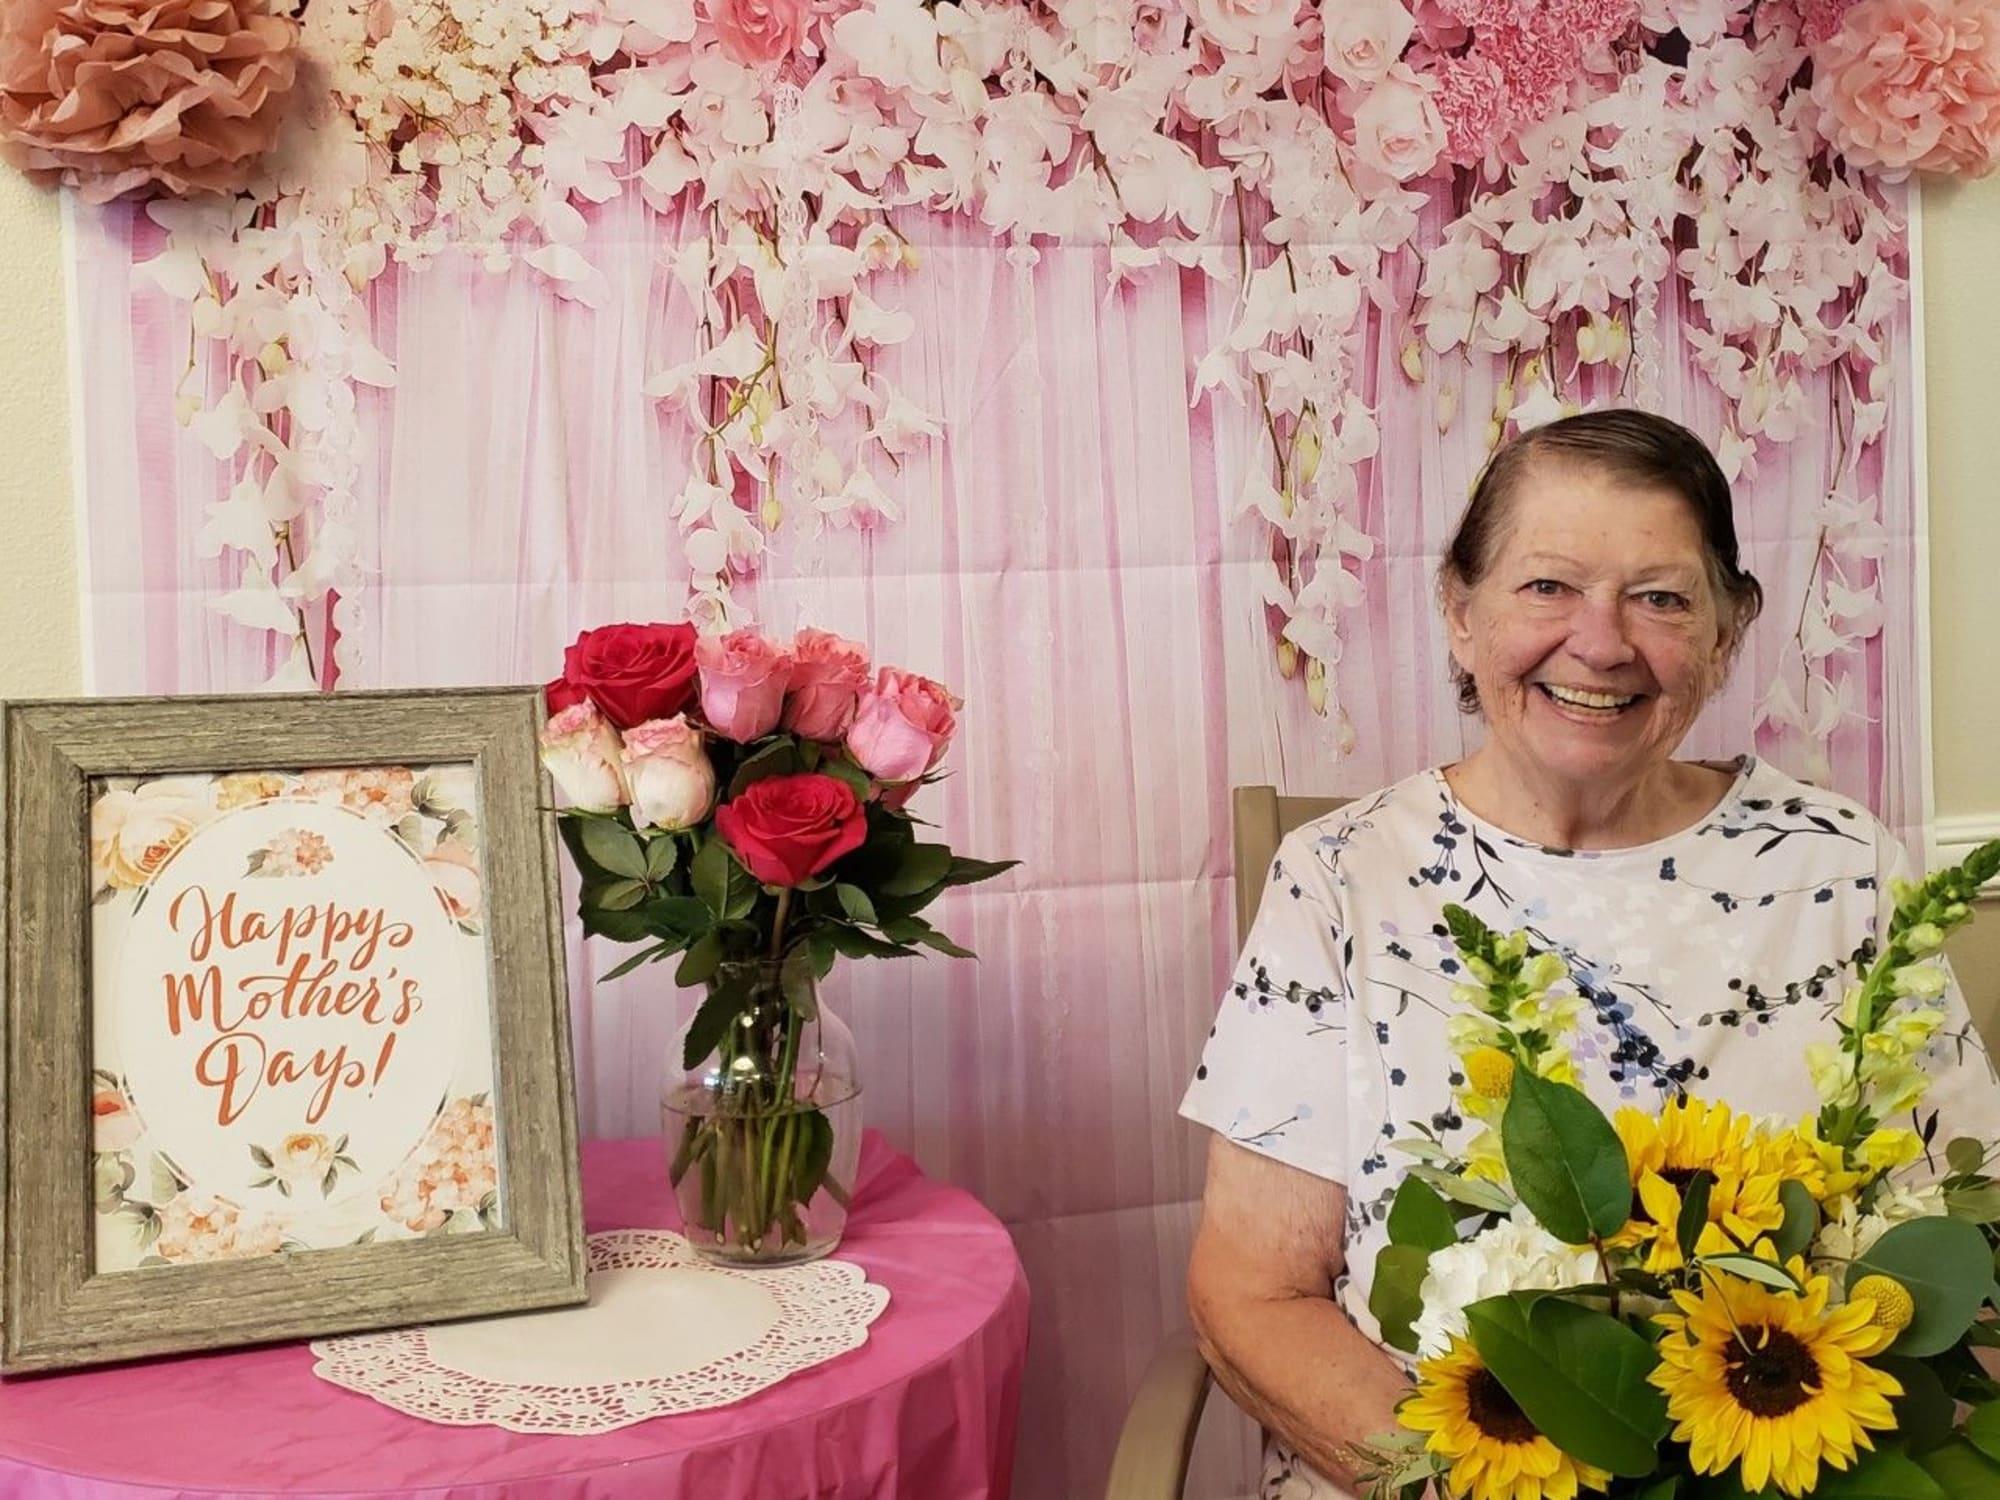 Mother's day at The Montera in La Mesa, CA